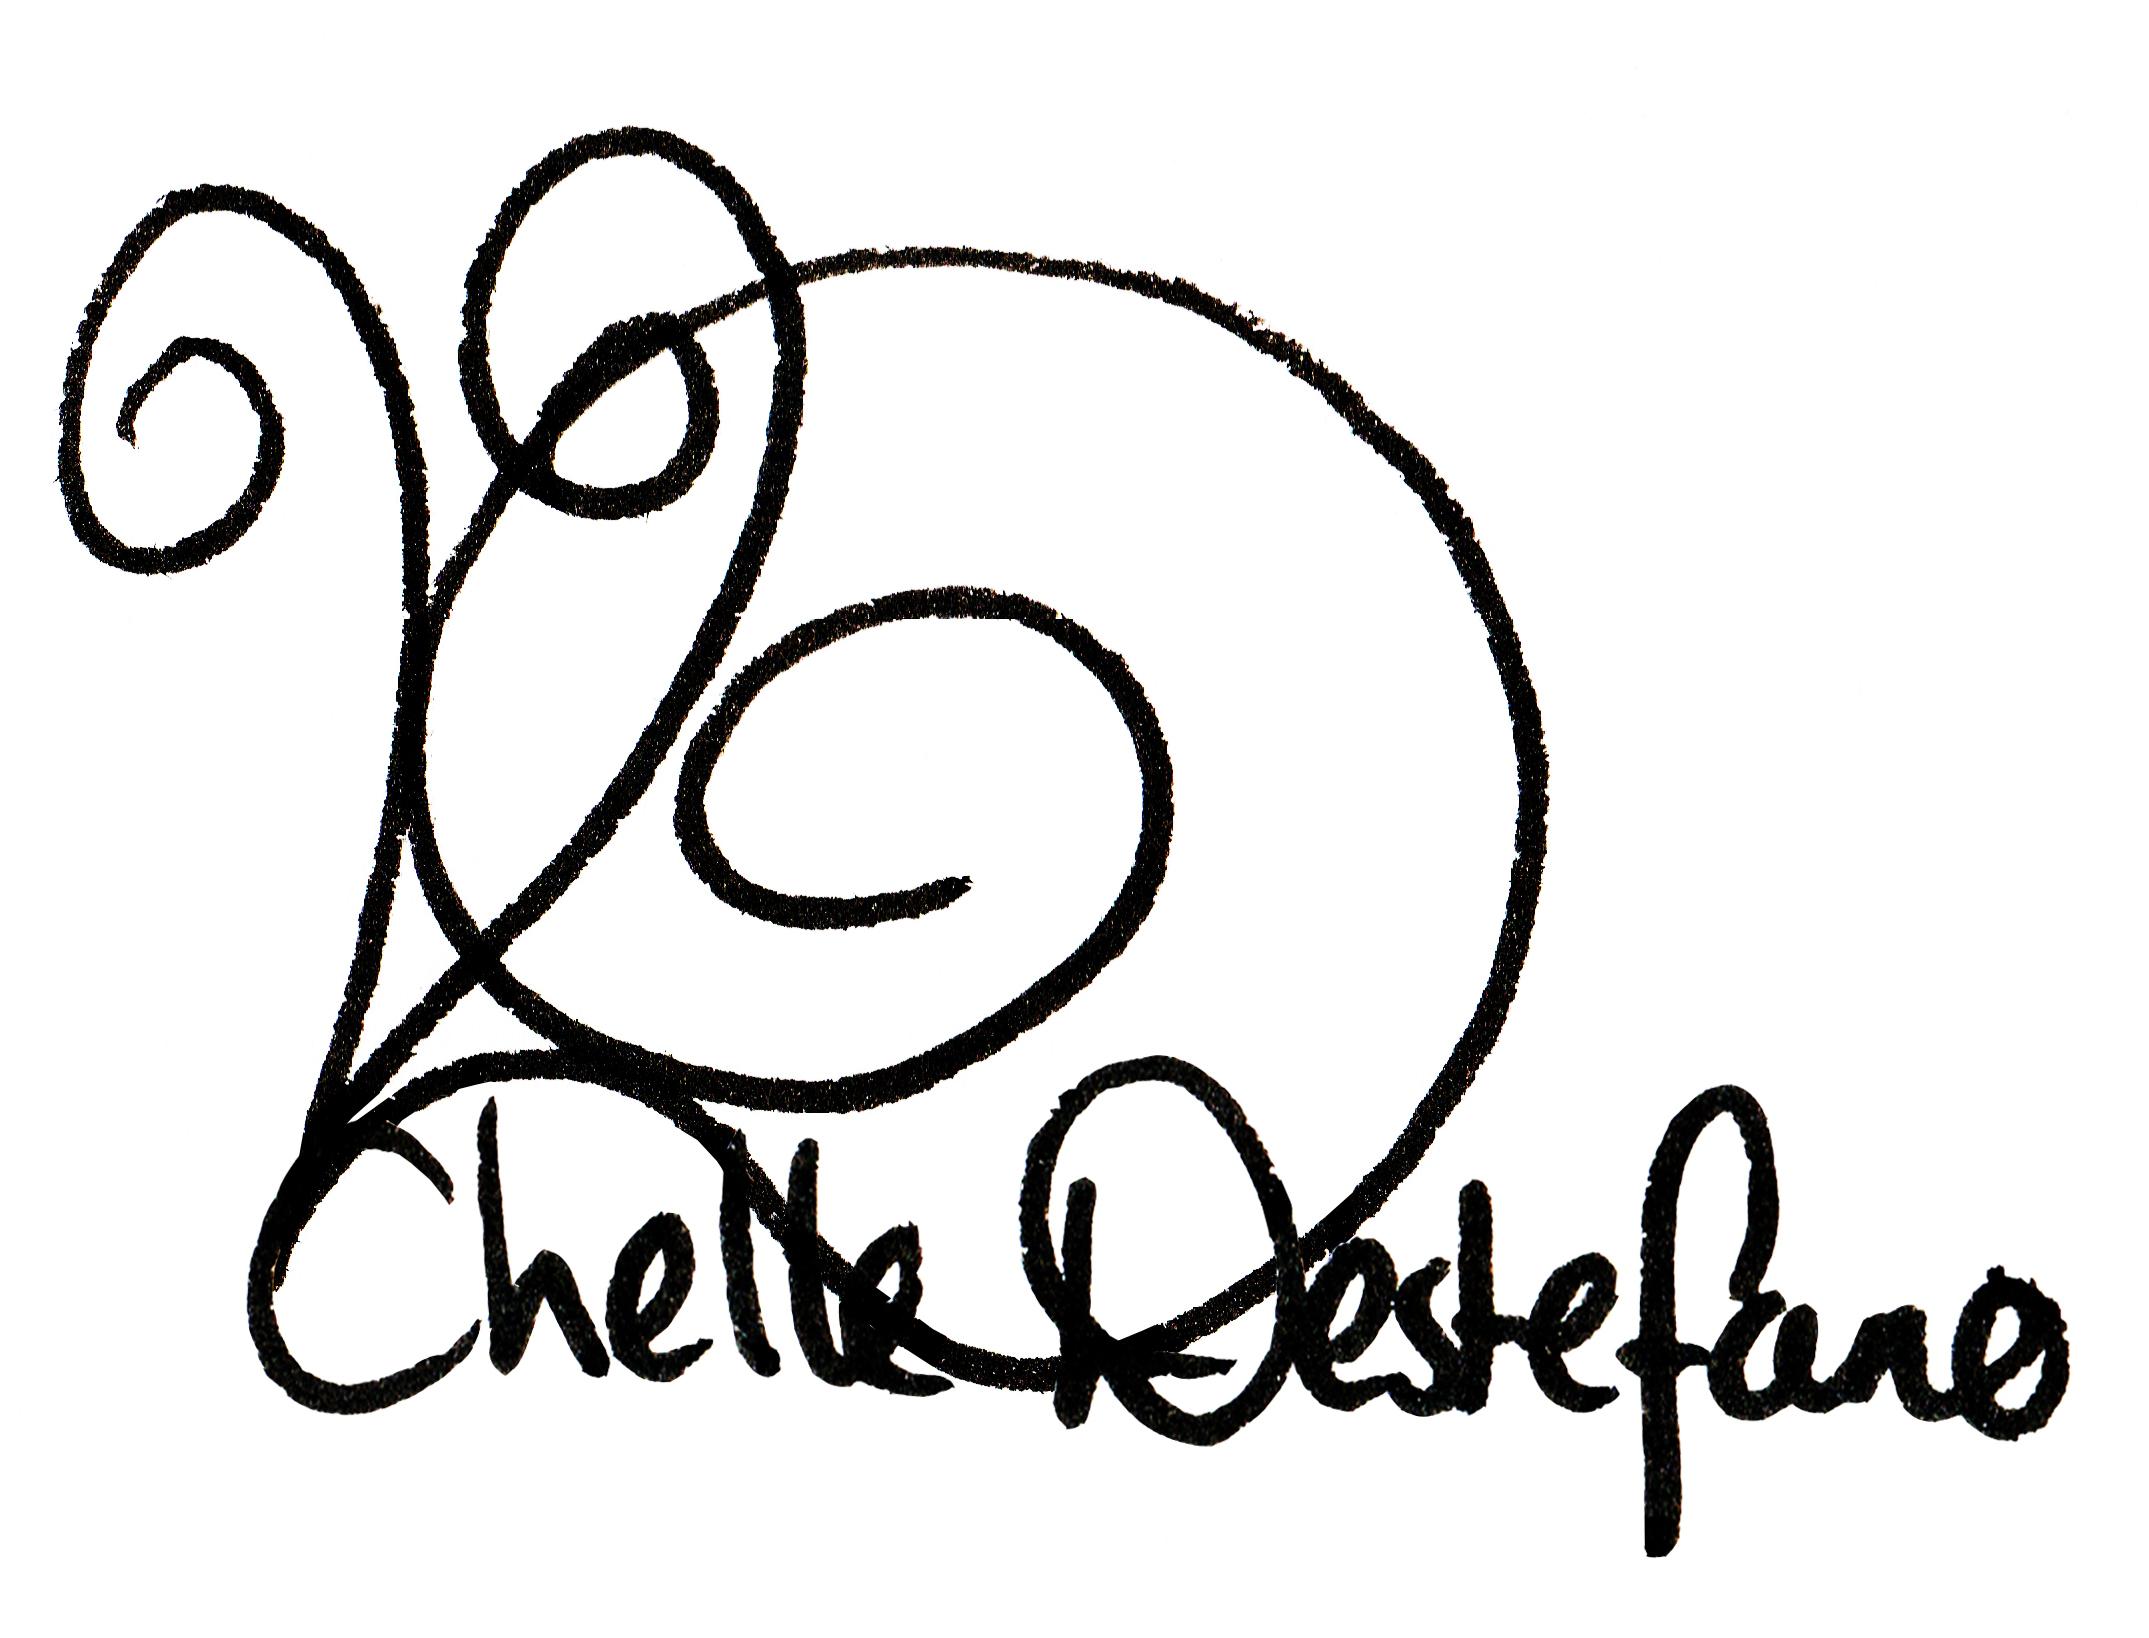 Chelle Destefano's Signature